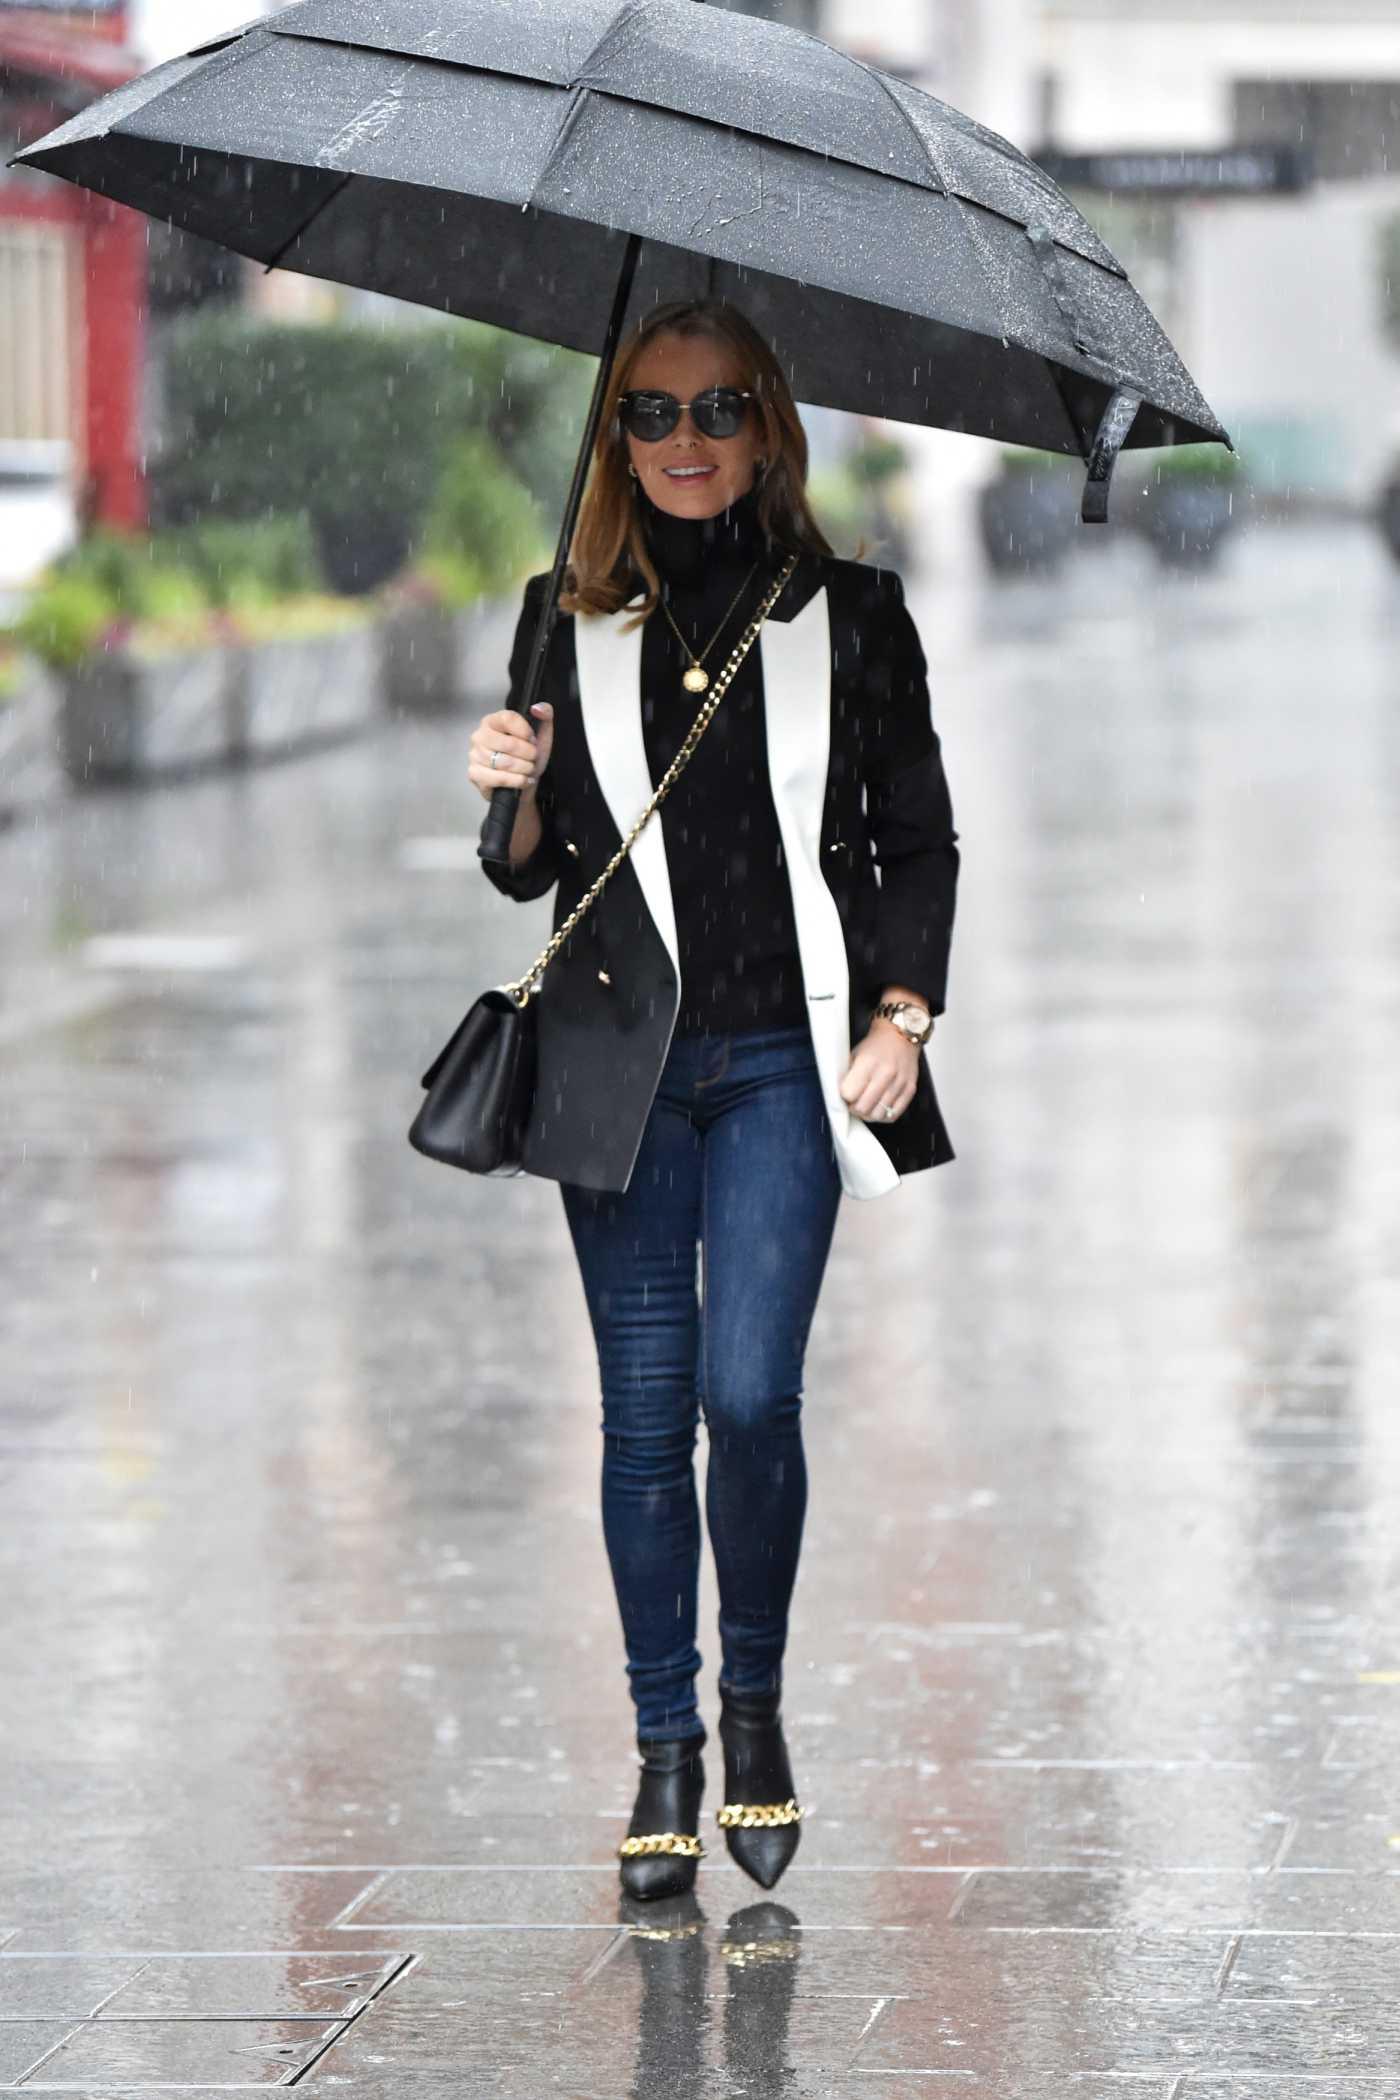 Amanda Holden in a Black Blazer Leaves the Heart Radio in the Rain in London 01/29/2021